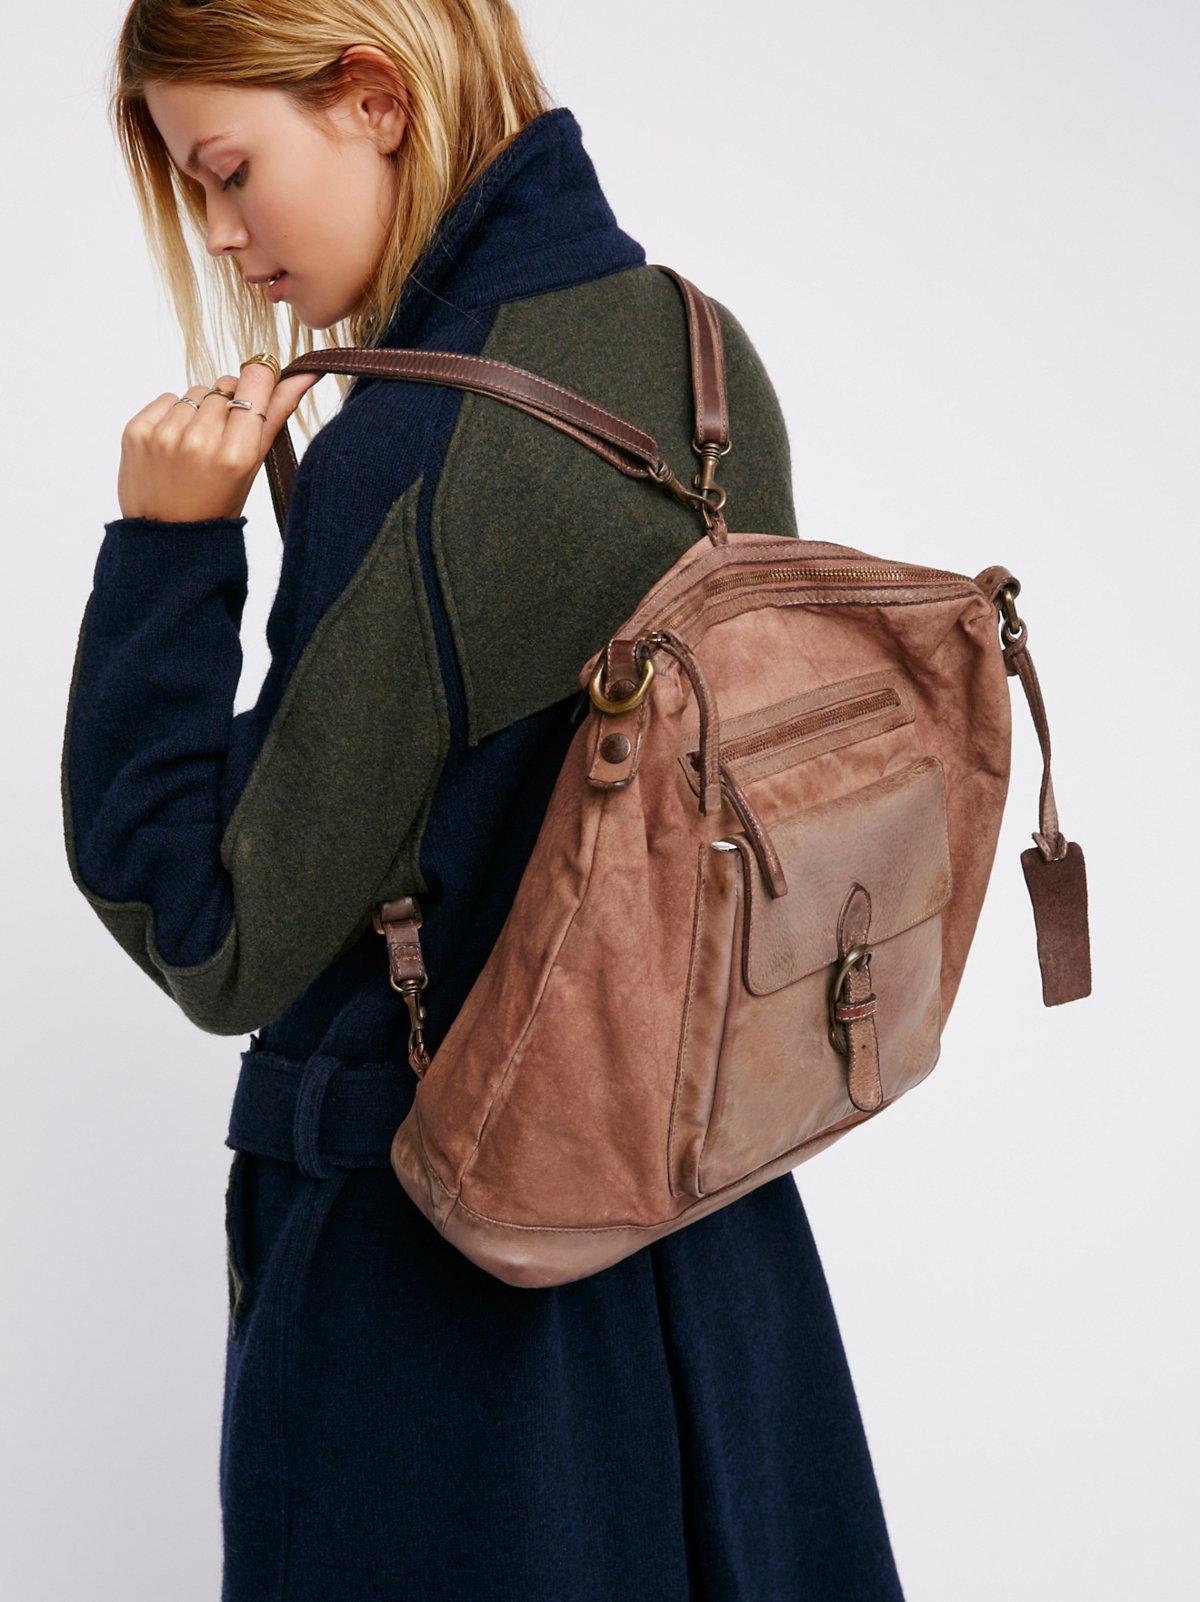 Boho Bags, Fringe Purses & Handbags | Free People UK